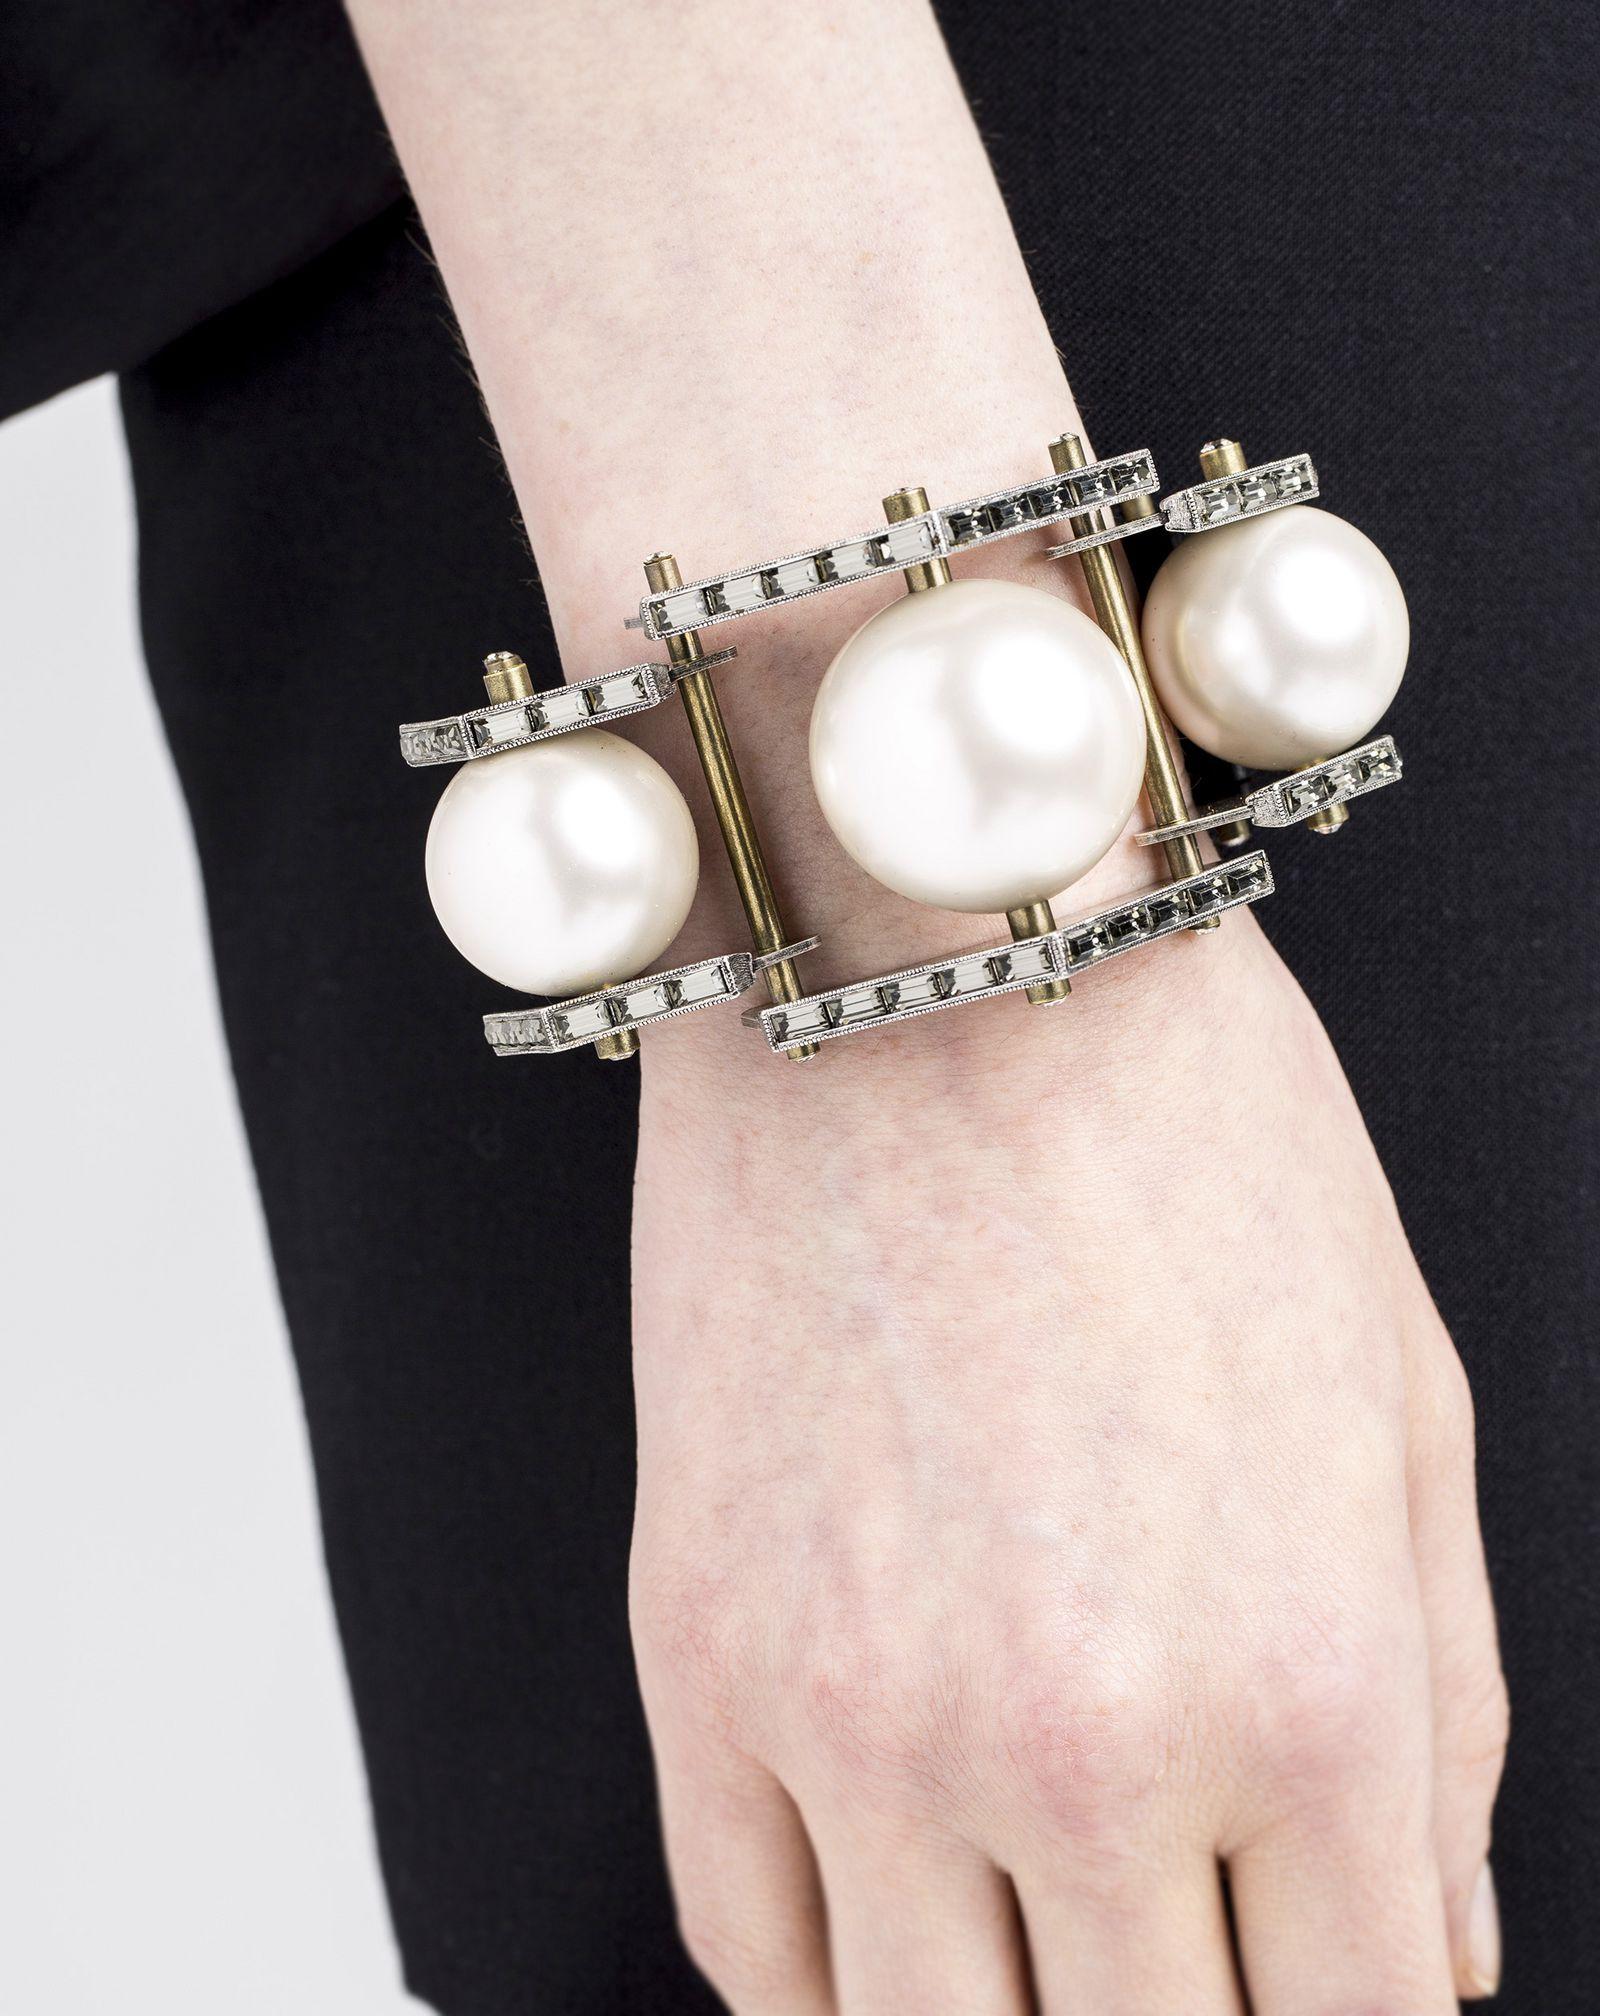 Lanvin pearls